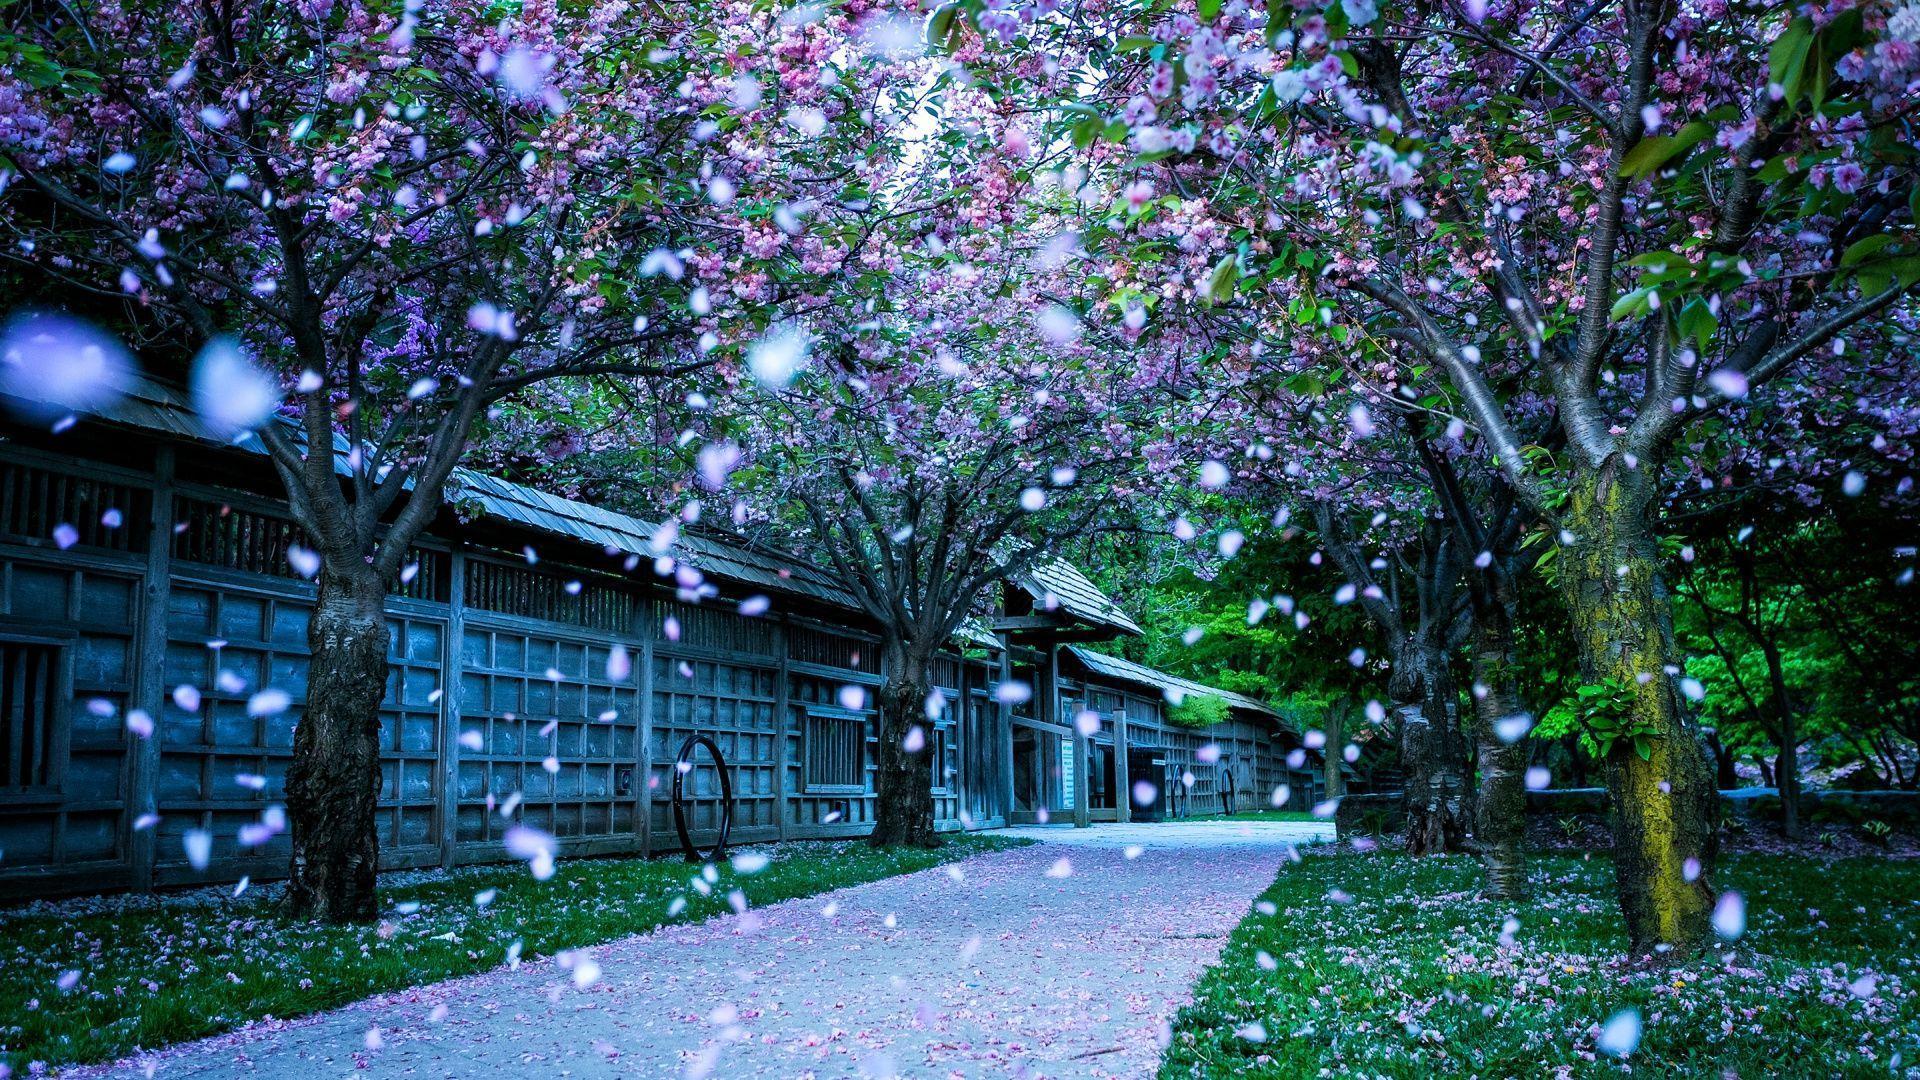 Hd wallpaper spring - Spring Nature Wallpaper